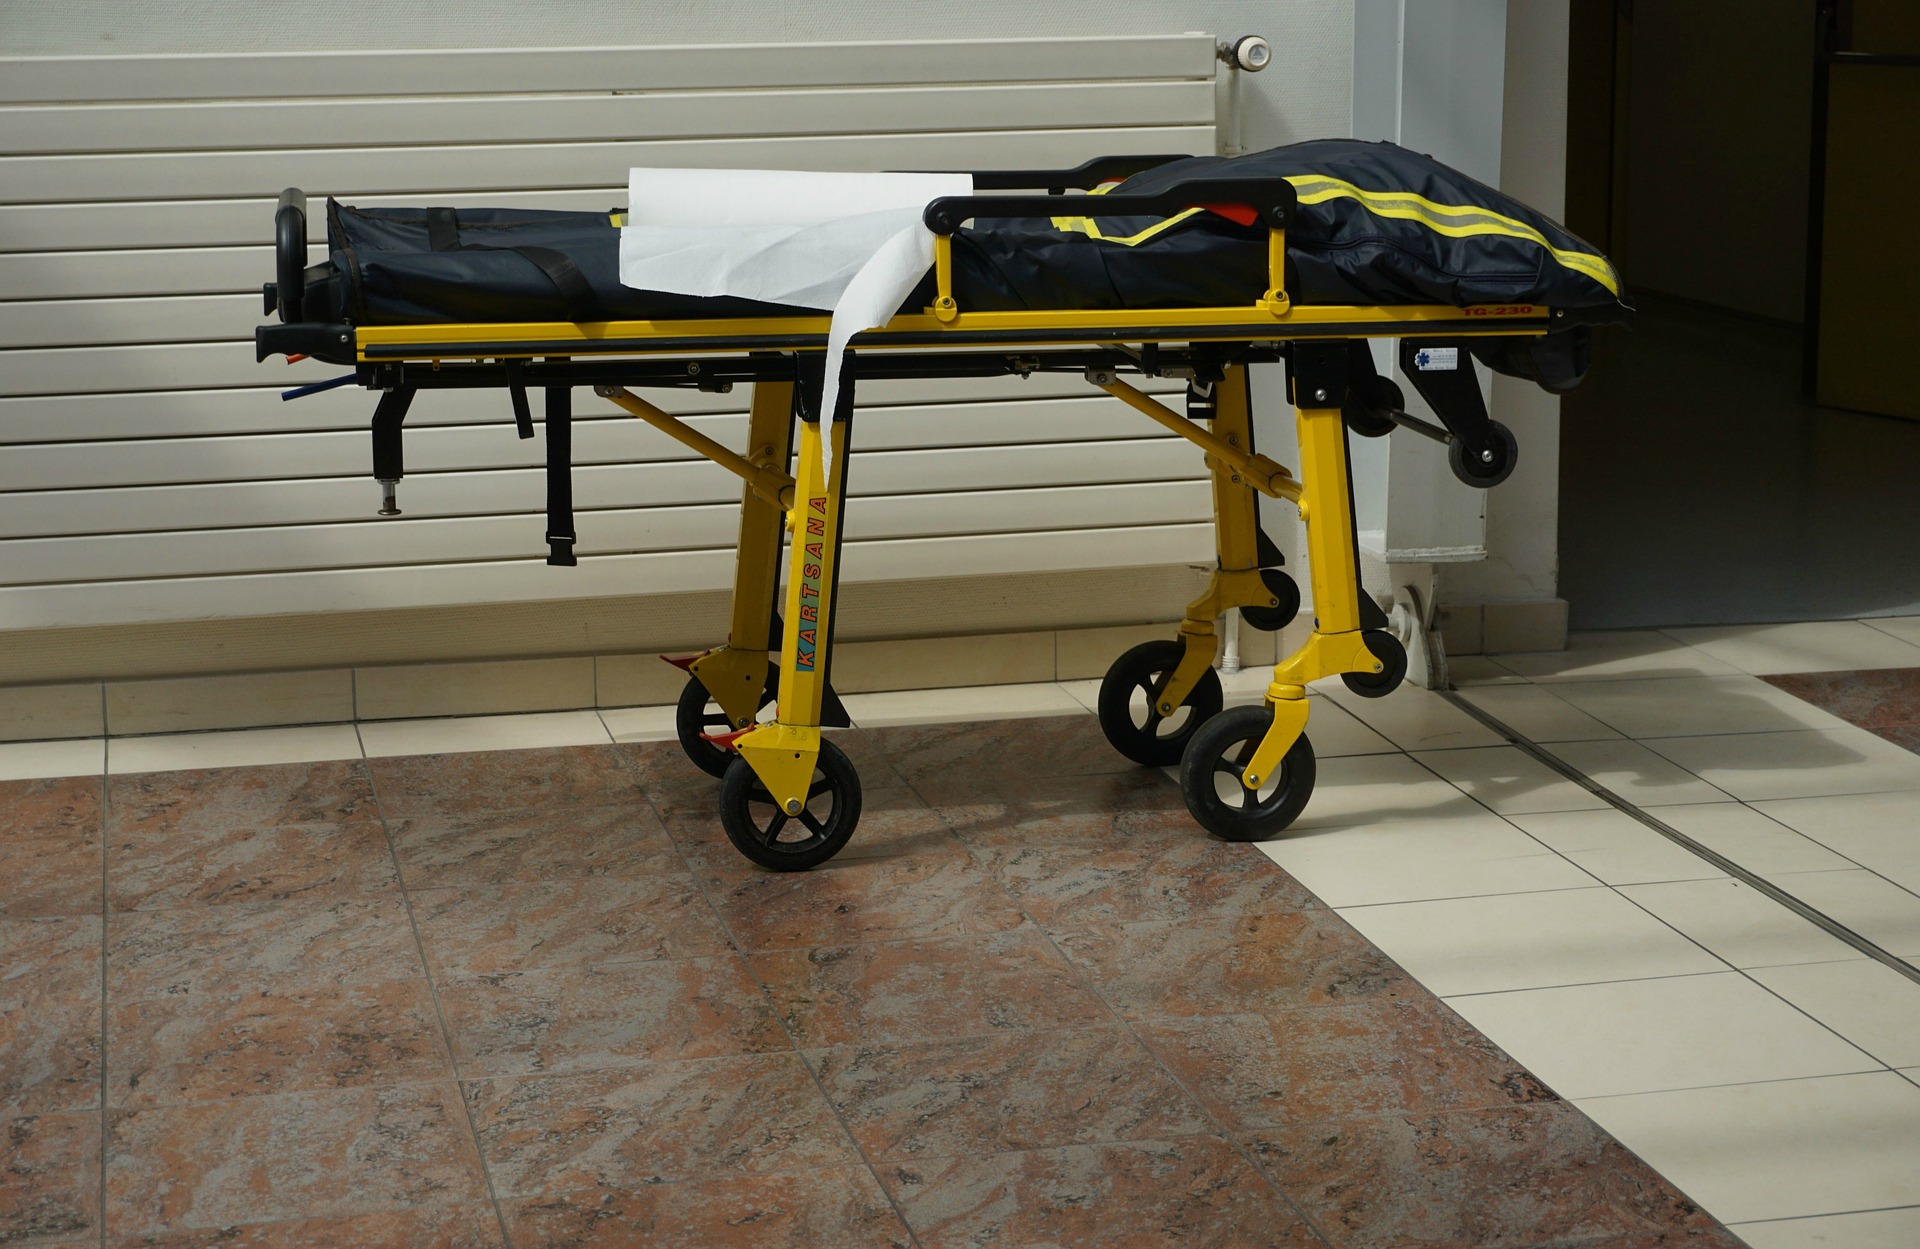 stretcher-1685611_1920